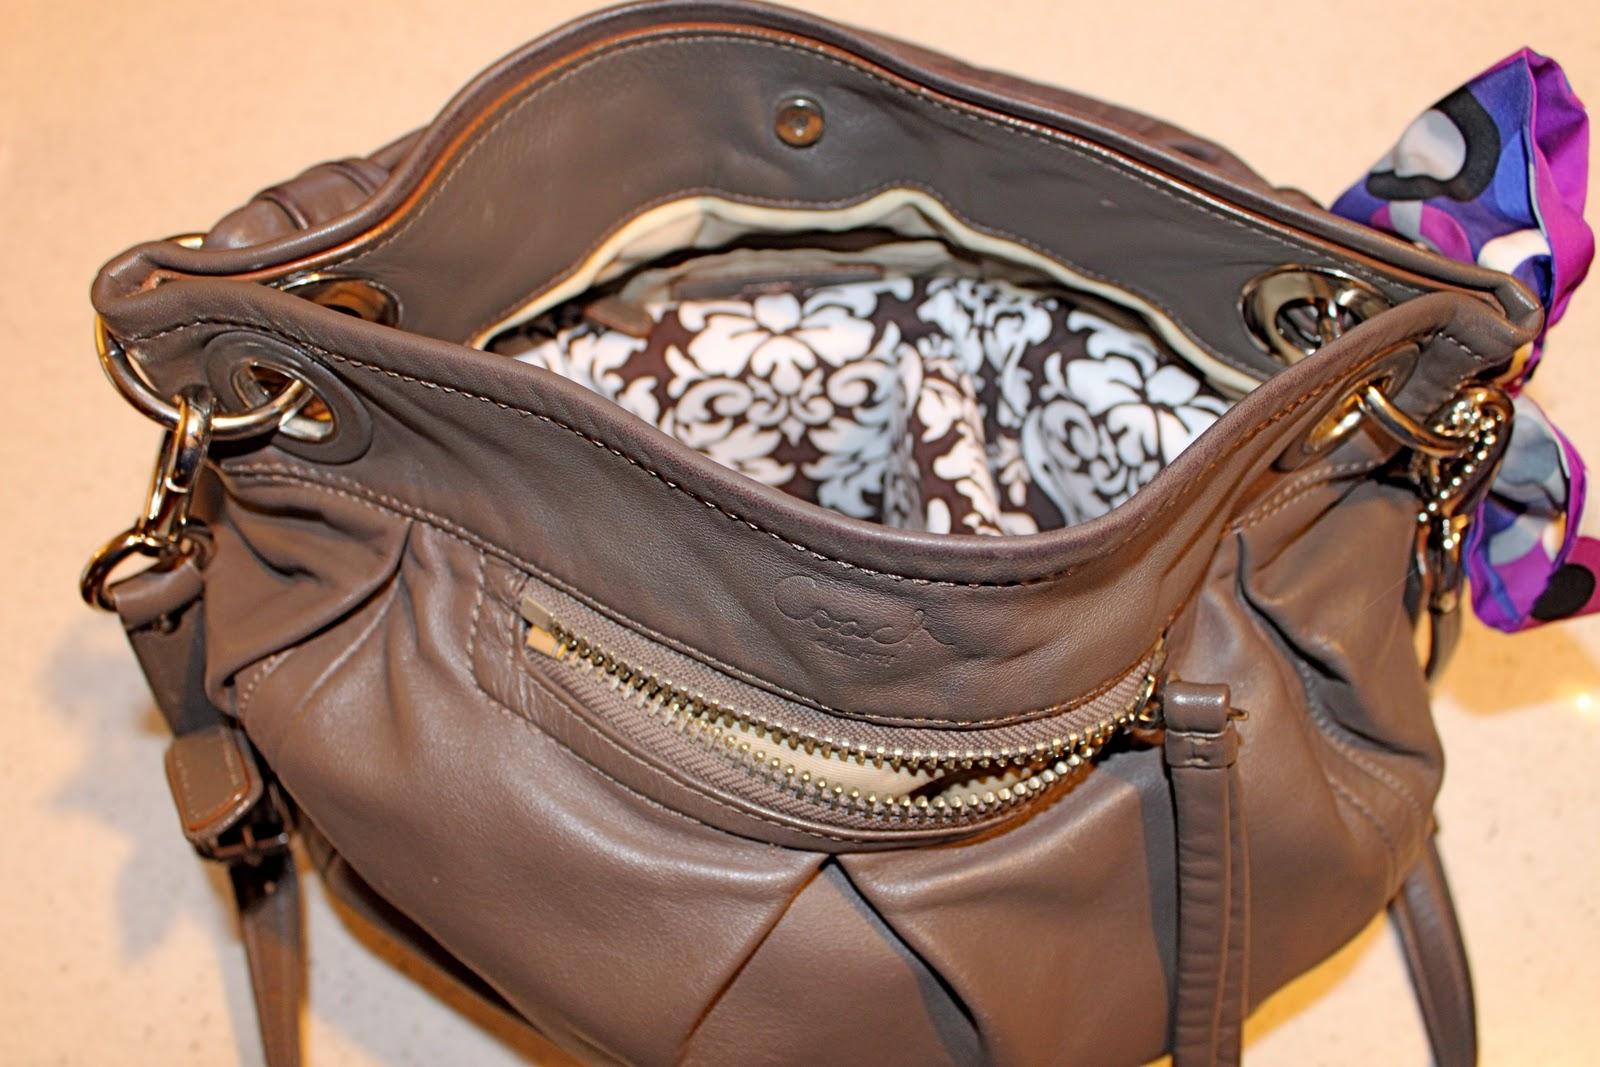 LOVEinLIFE: DIY DSLR Camera Bag/Purse